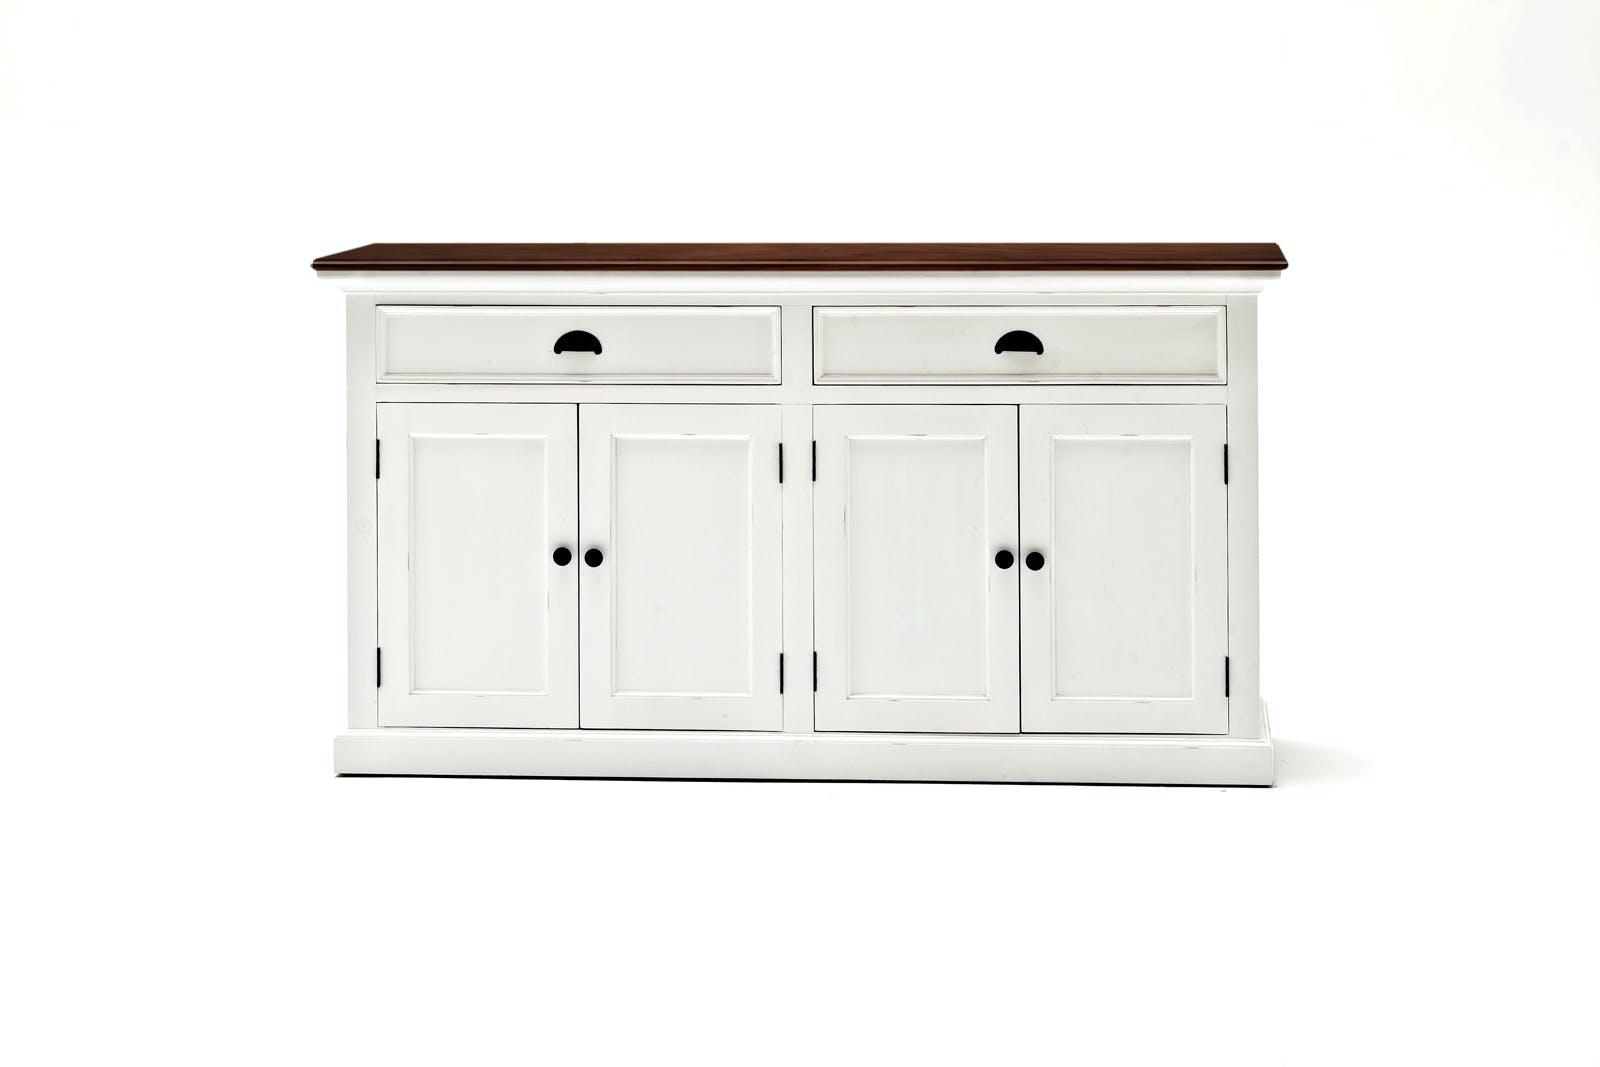 Buffet enfilade blanc plateau acajou 2 tiroirs 4 portes 145x85cm ROYAN